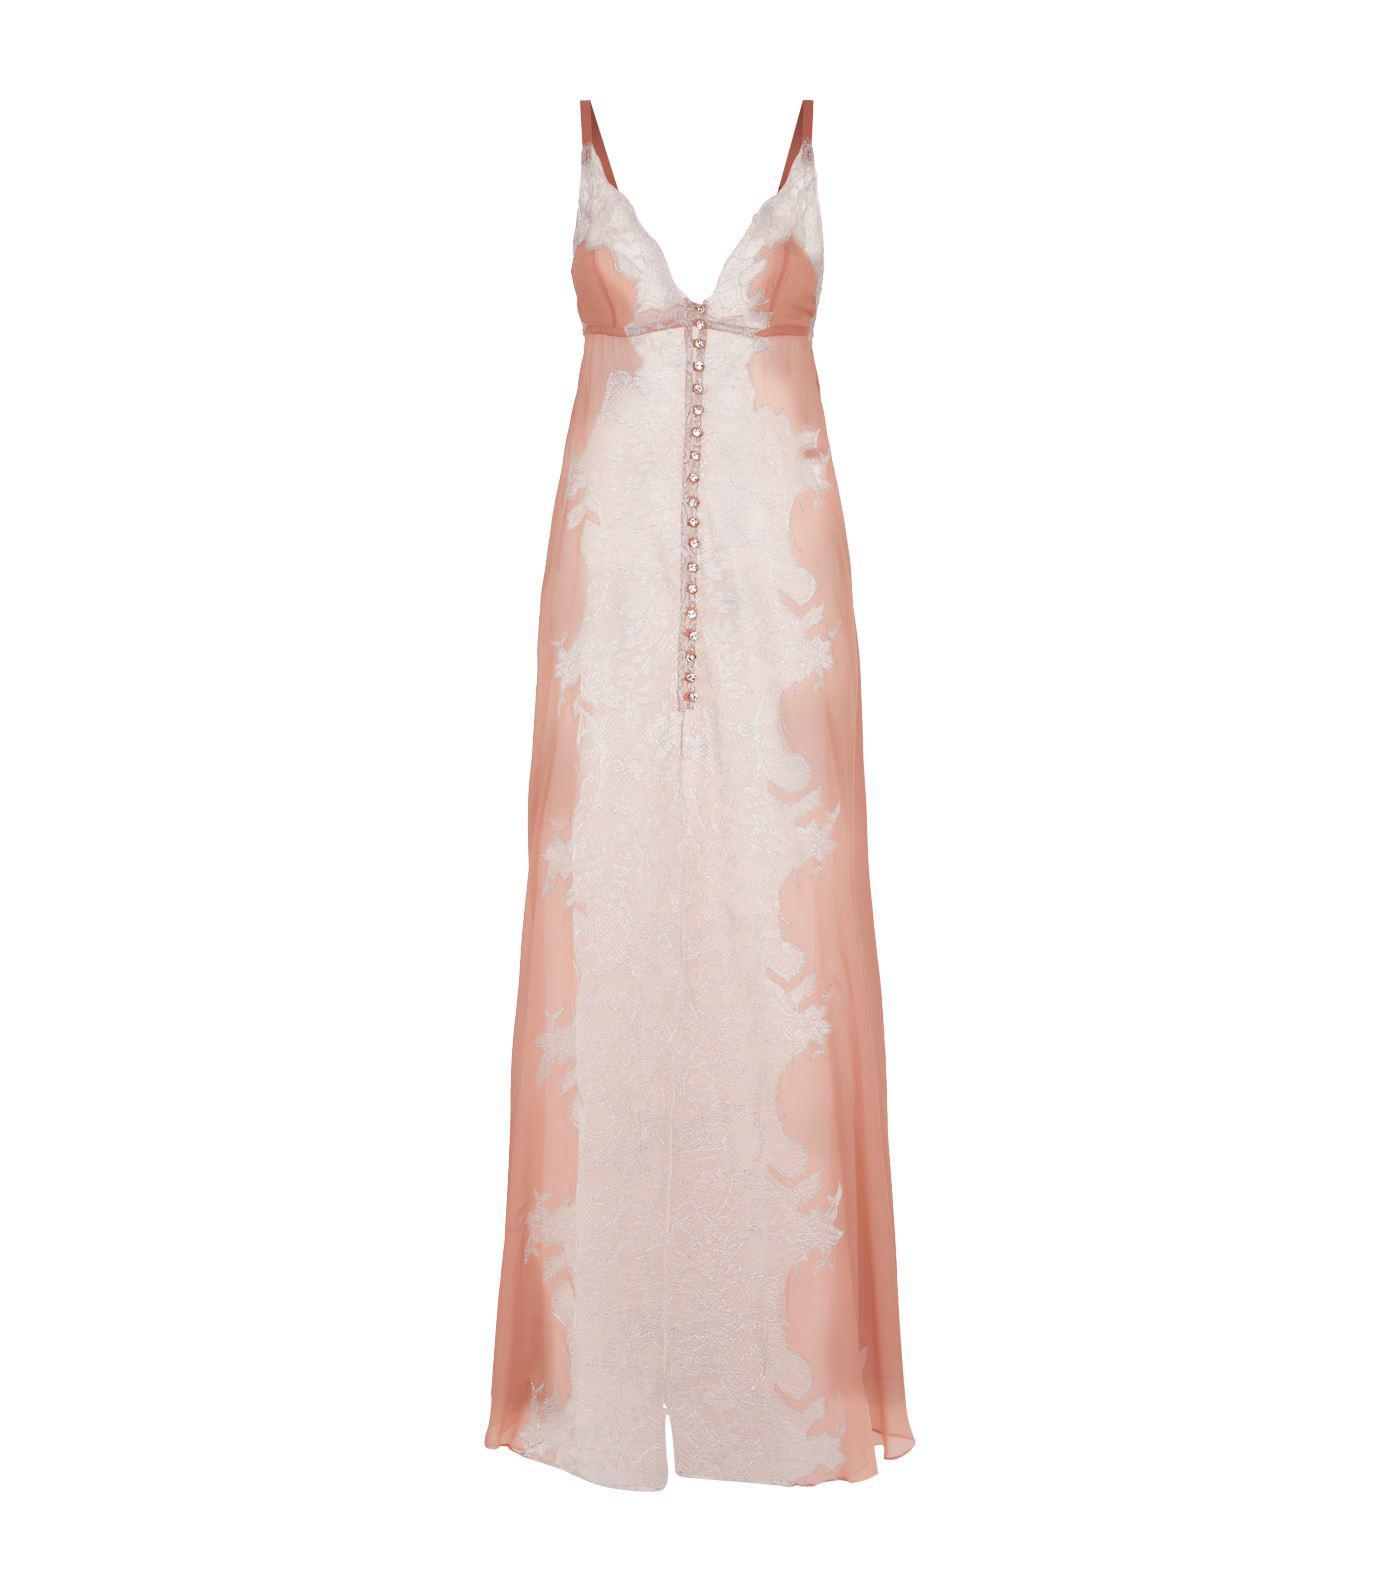 Lyst - Rosamosario Lace Trim Nightdress in Pink c5c3feb84